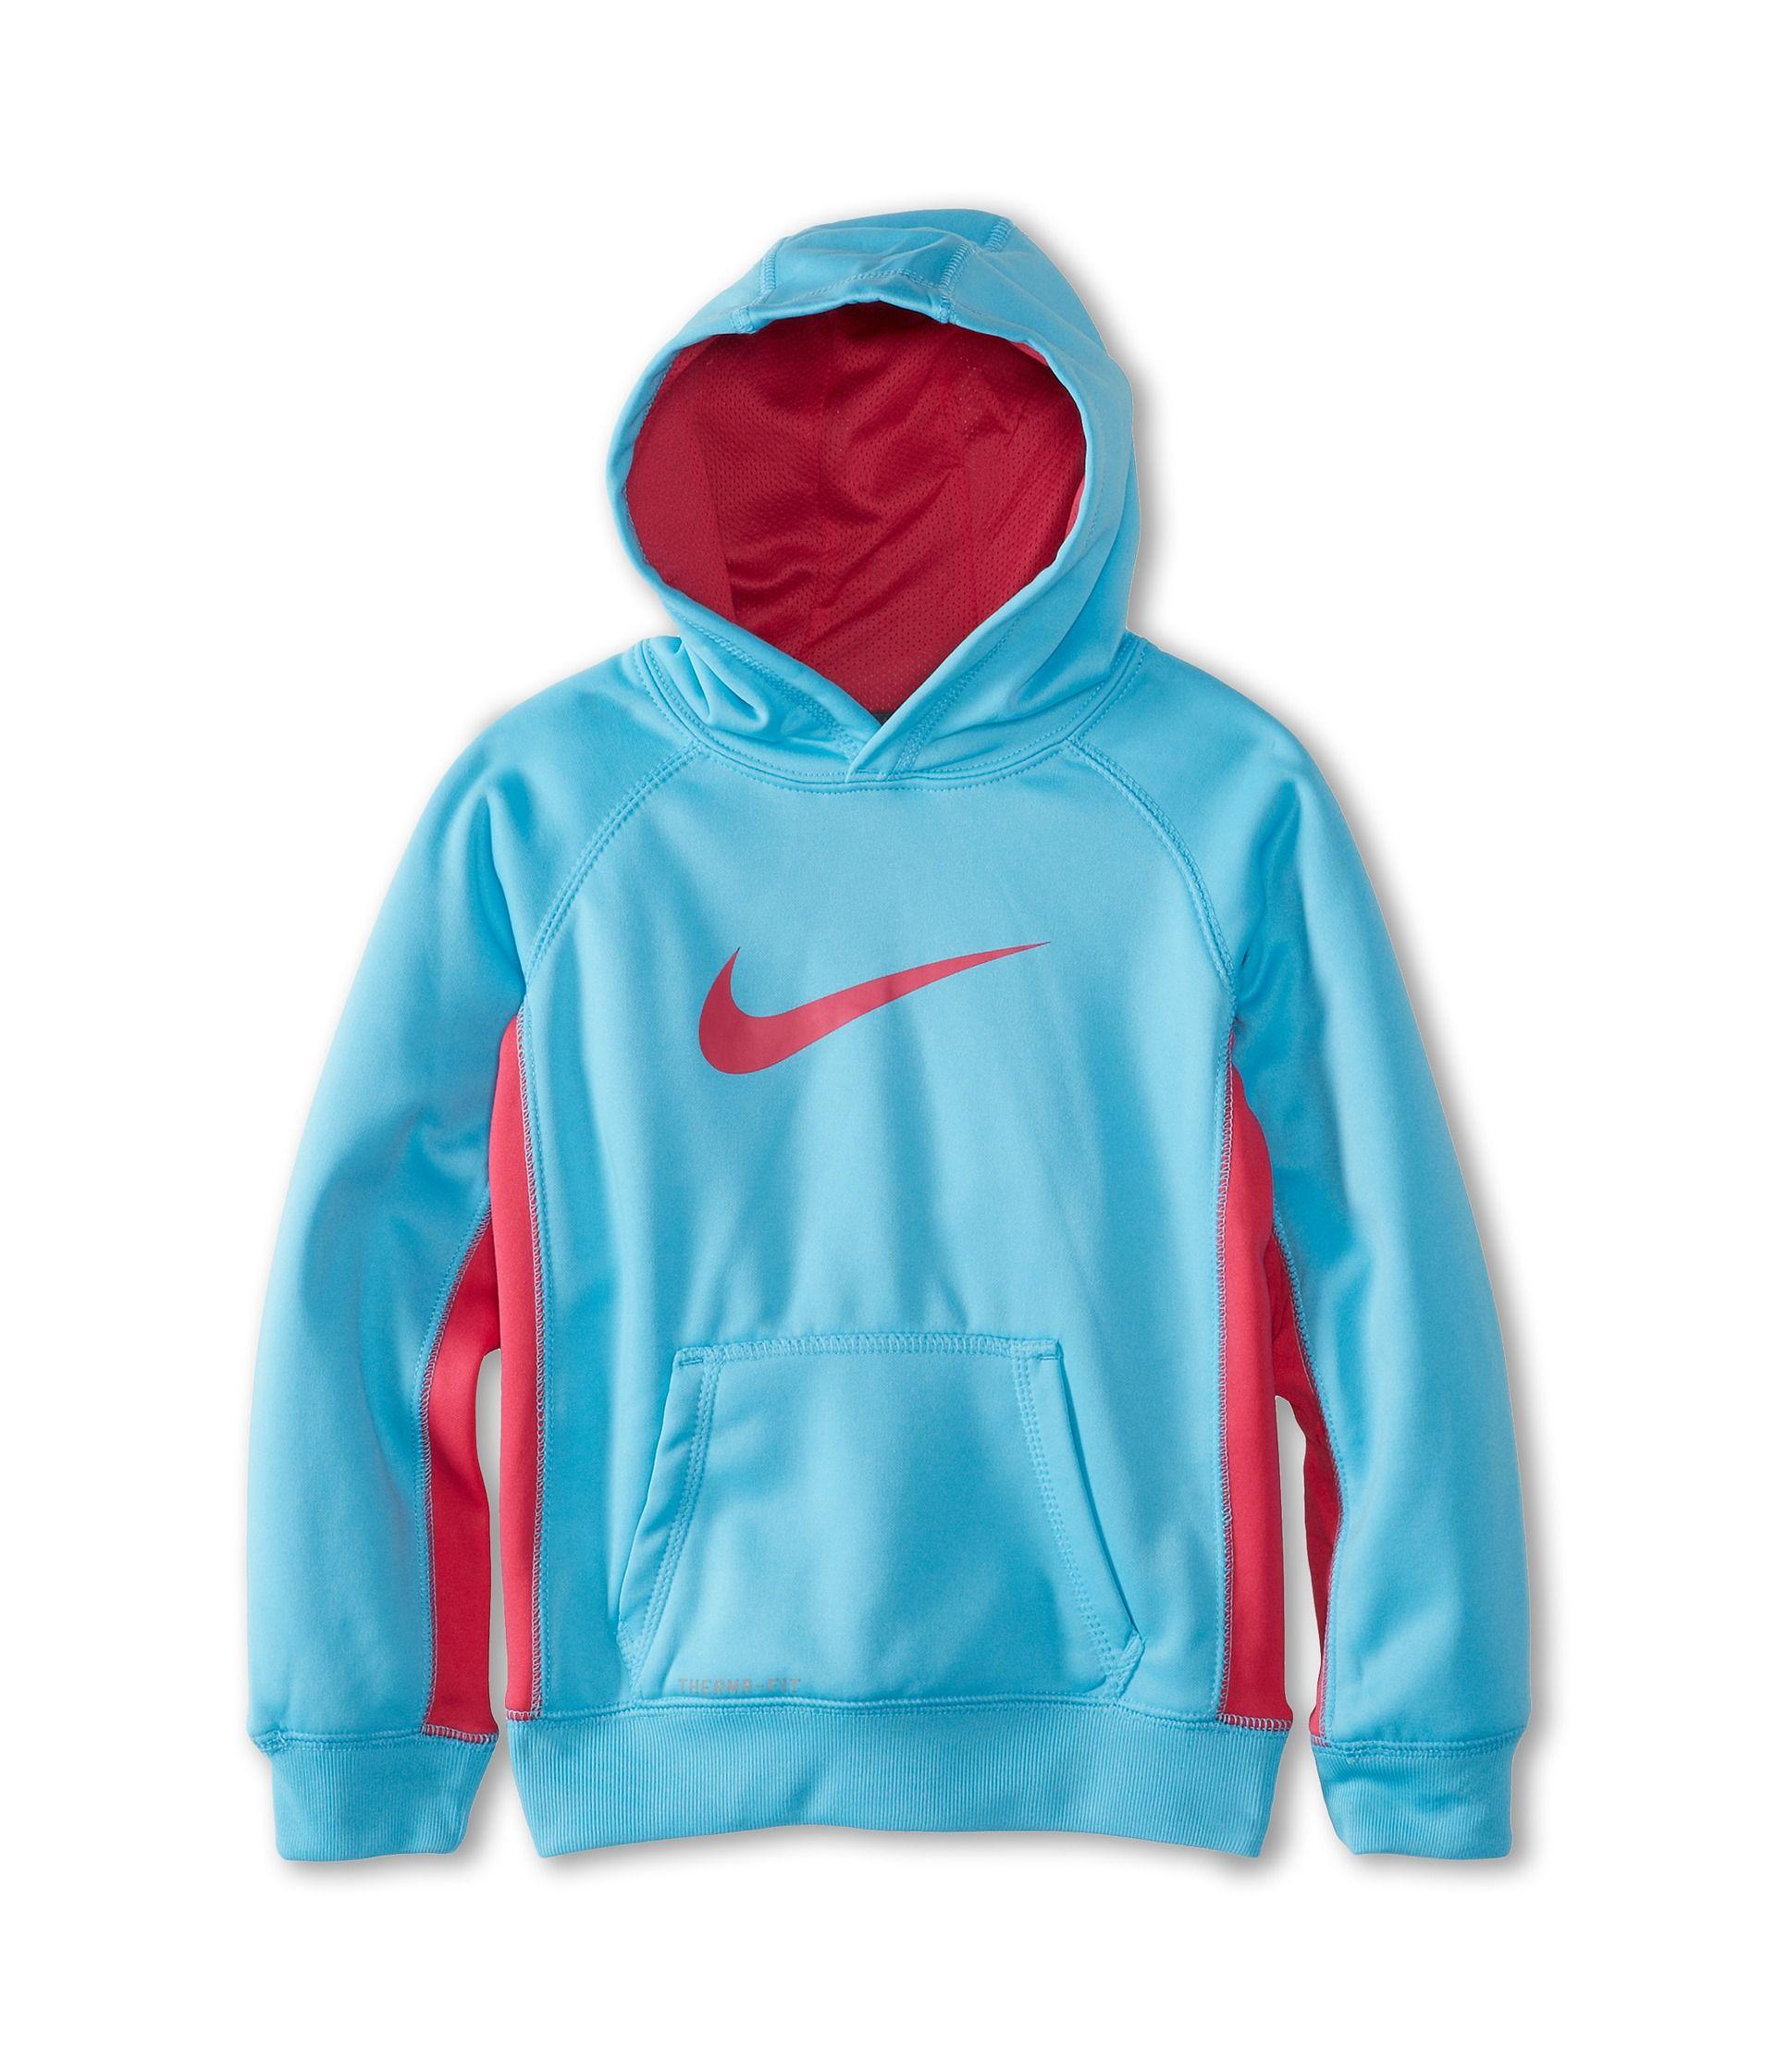 nike swetater for girls - Google Search | Sportswear | Pinterest ...